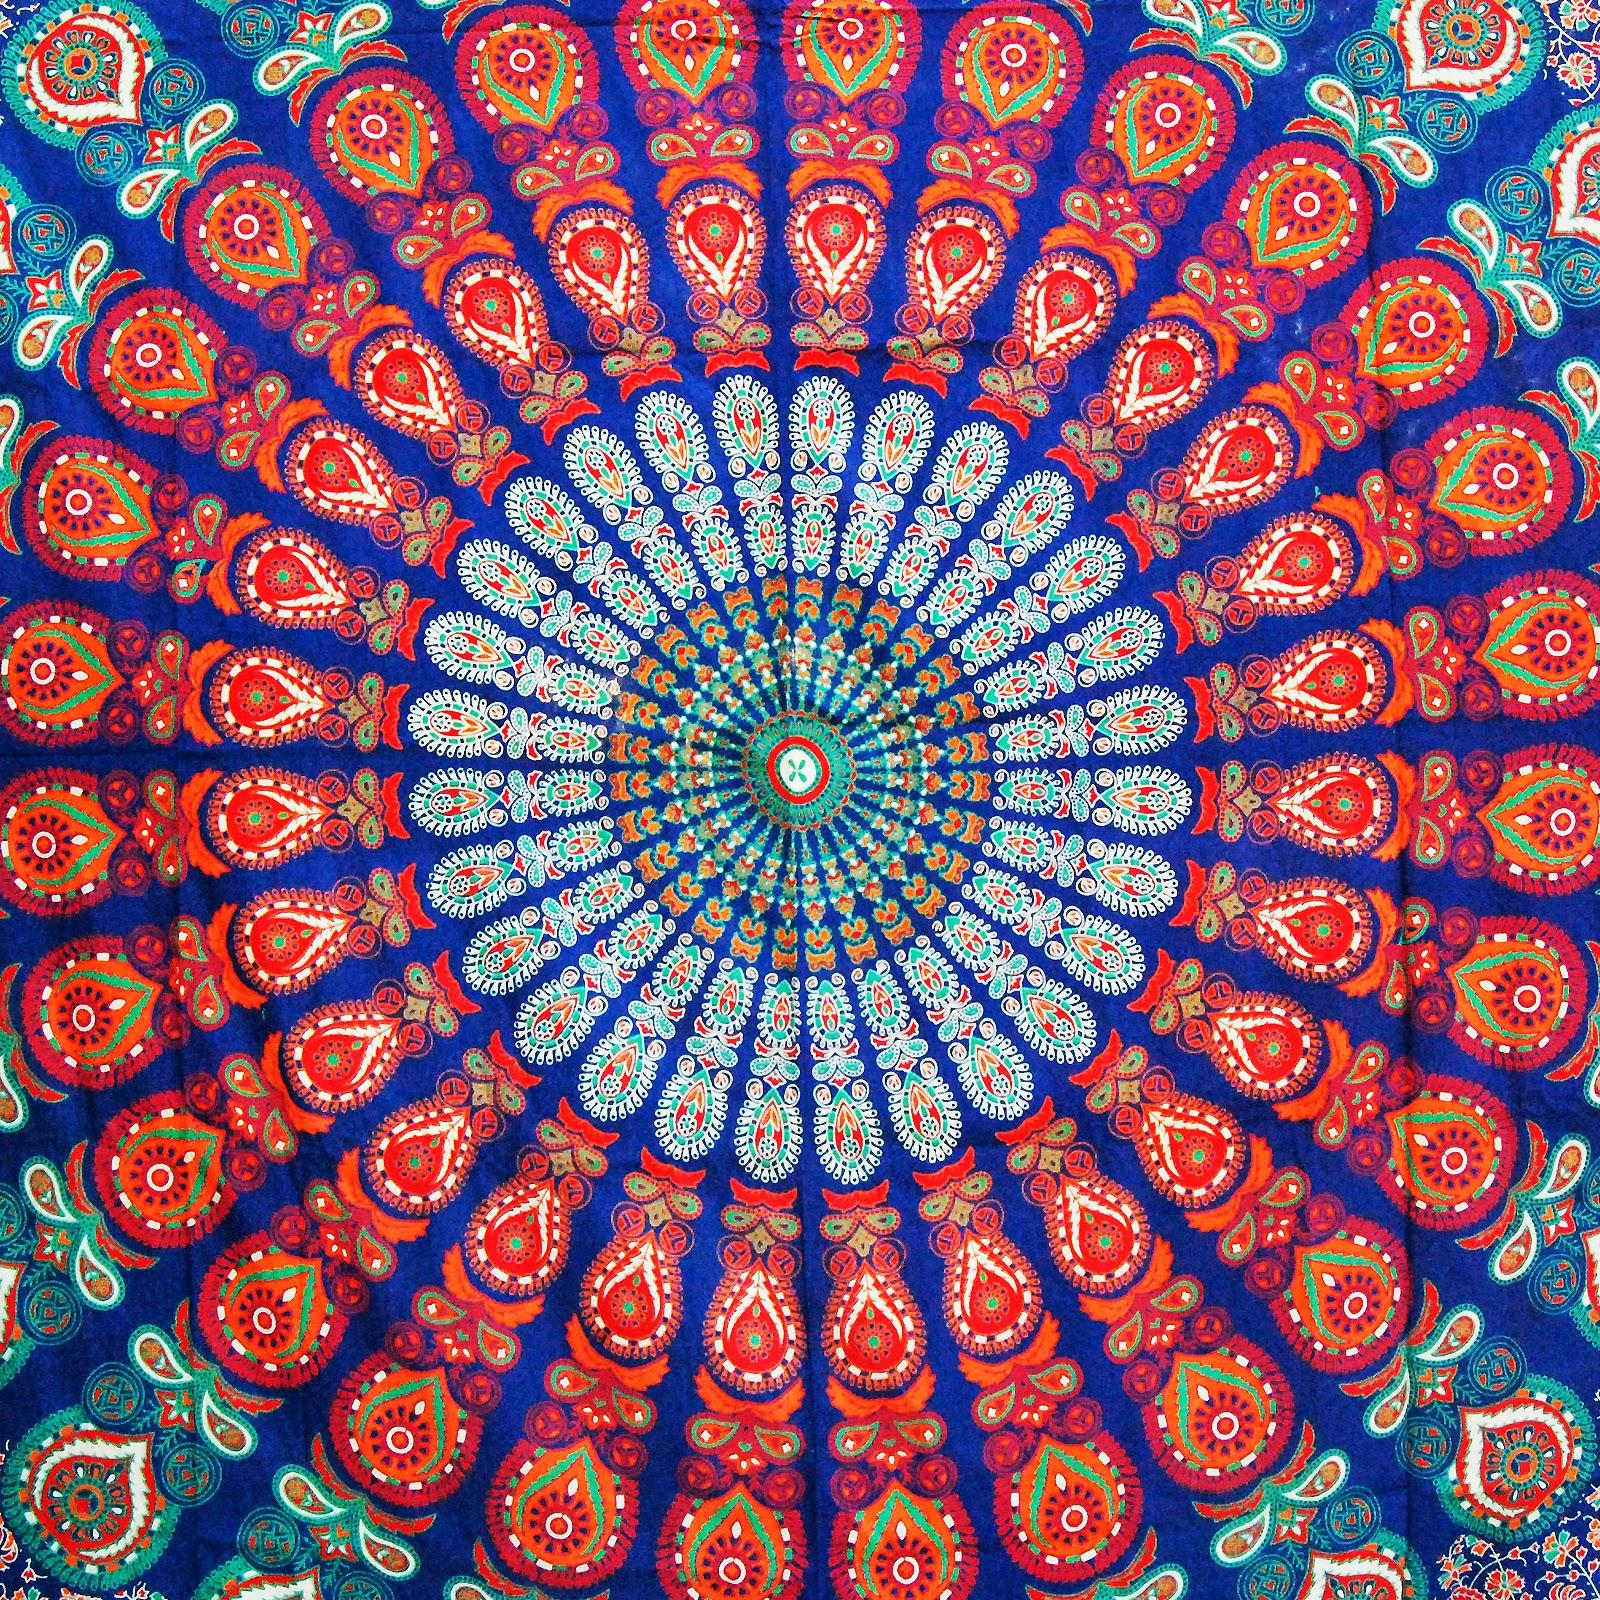 hippie tapestries mandala tapestries queen boho tapestries wall queen indian cotton psychedelic mandala tapestry large wall hanging hippie bedding throw bedspread bohemian boho ethnic decor art